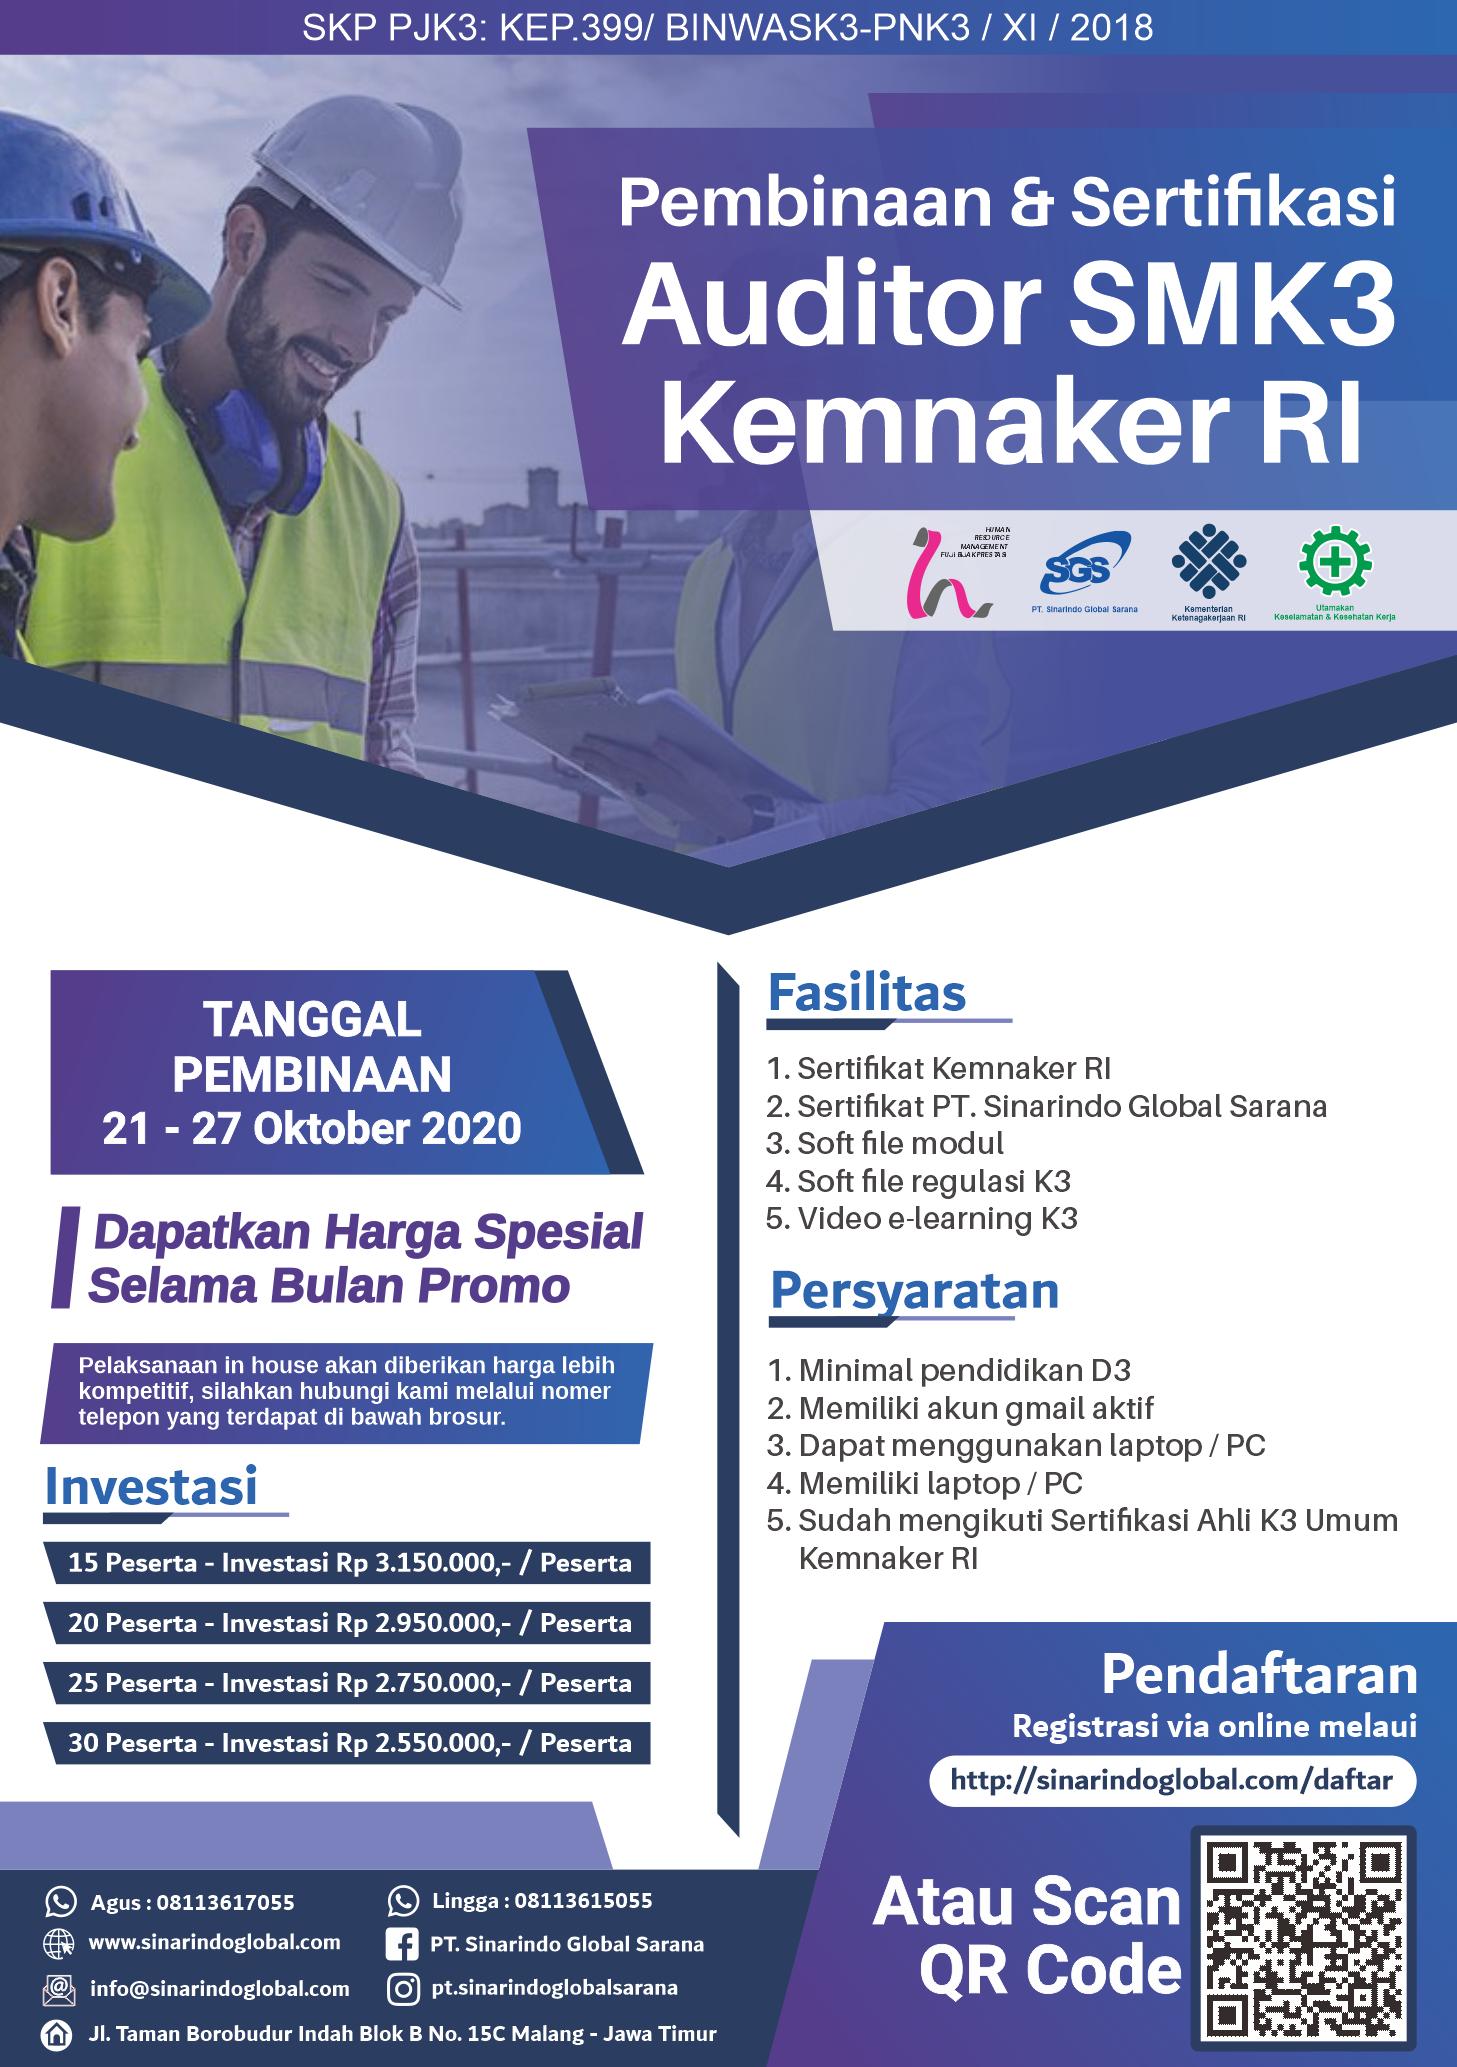 Sertifikat Auditor SMK3 ( 013_Heri Misbah Dijaya )